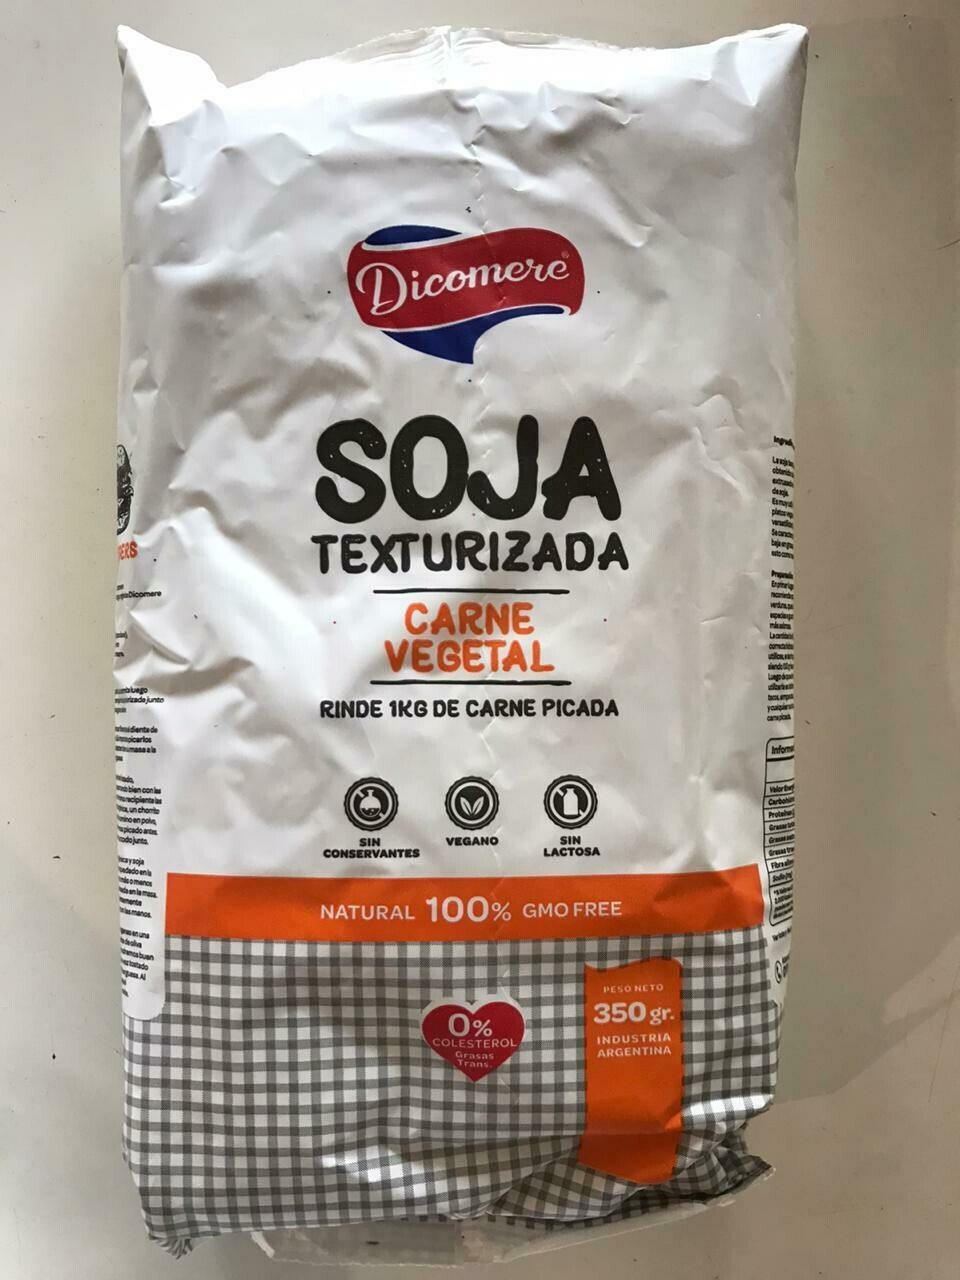 SOJA TEXTURIZADA, DICOMERE, 350 gr